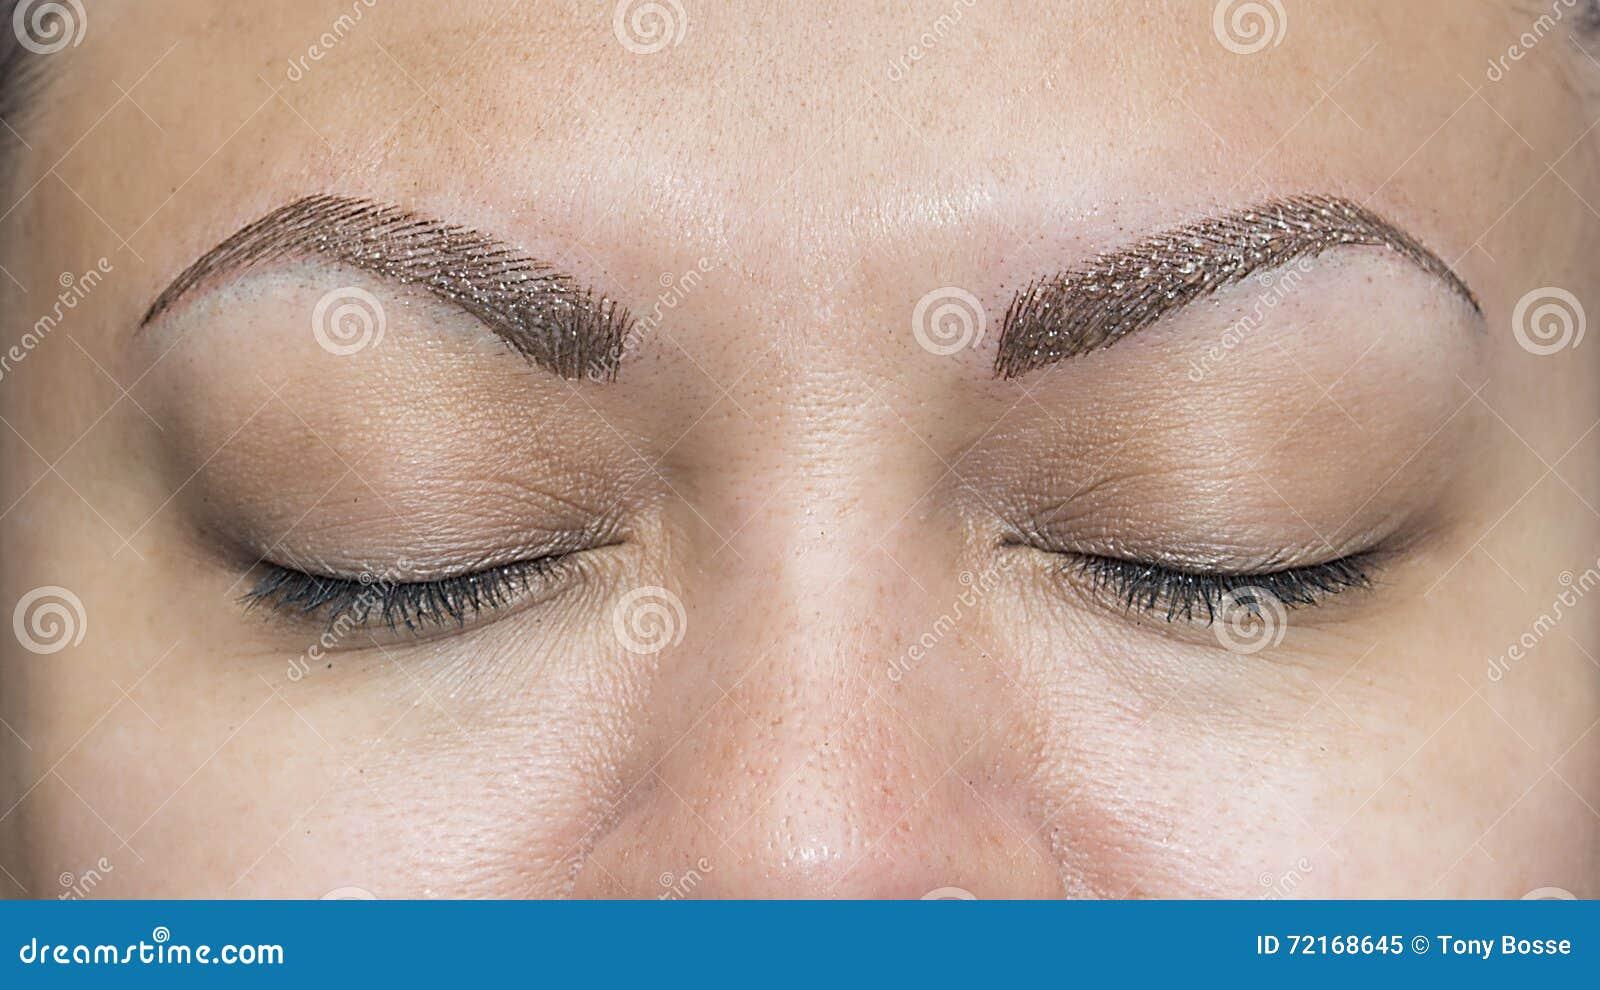 Realistic Makeup Eyebrow Tattoos Stock Image - Image of woman ...